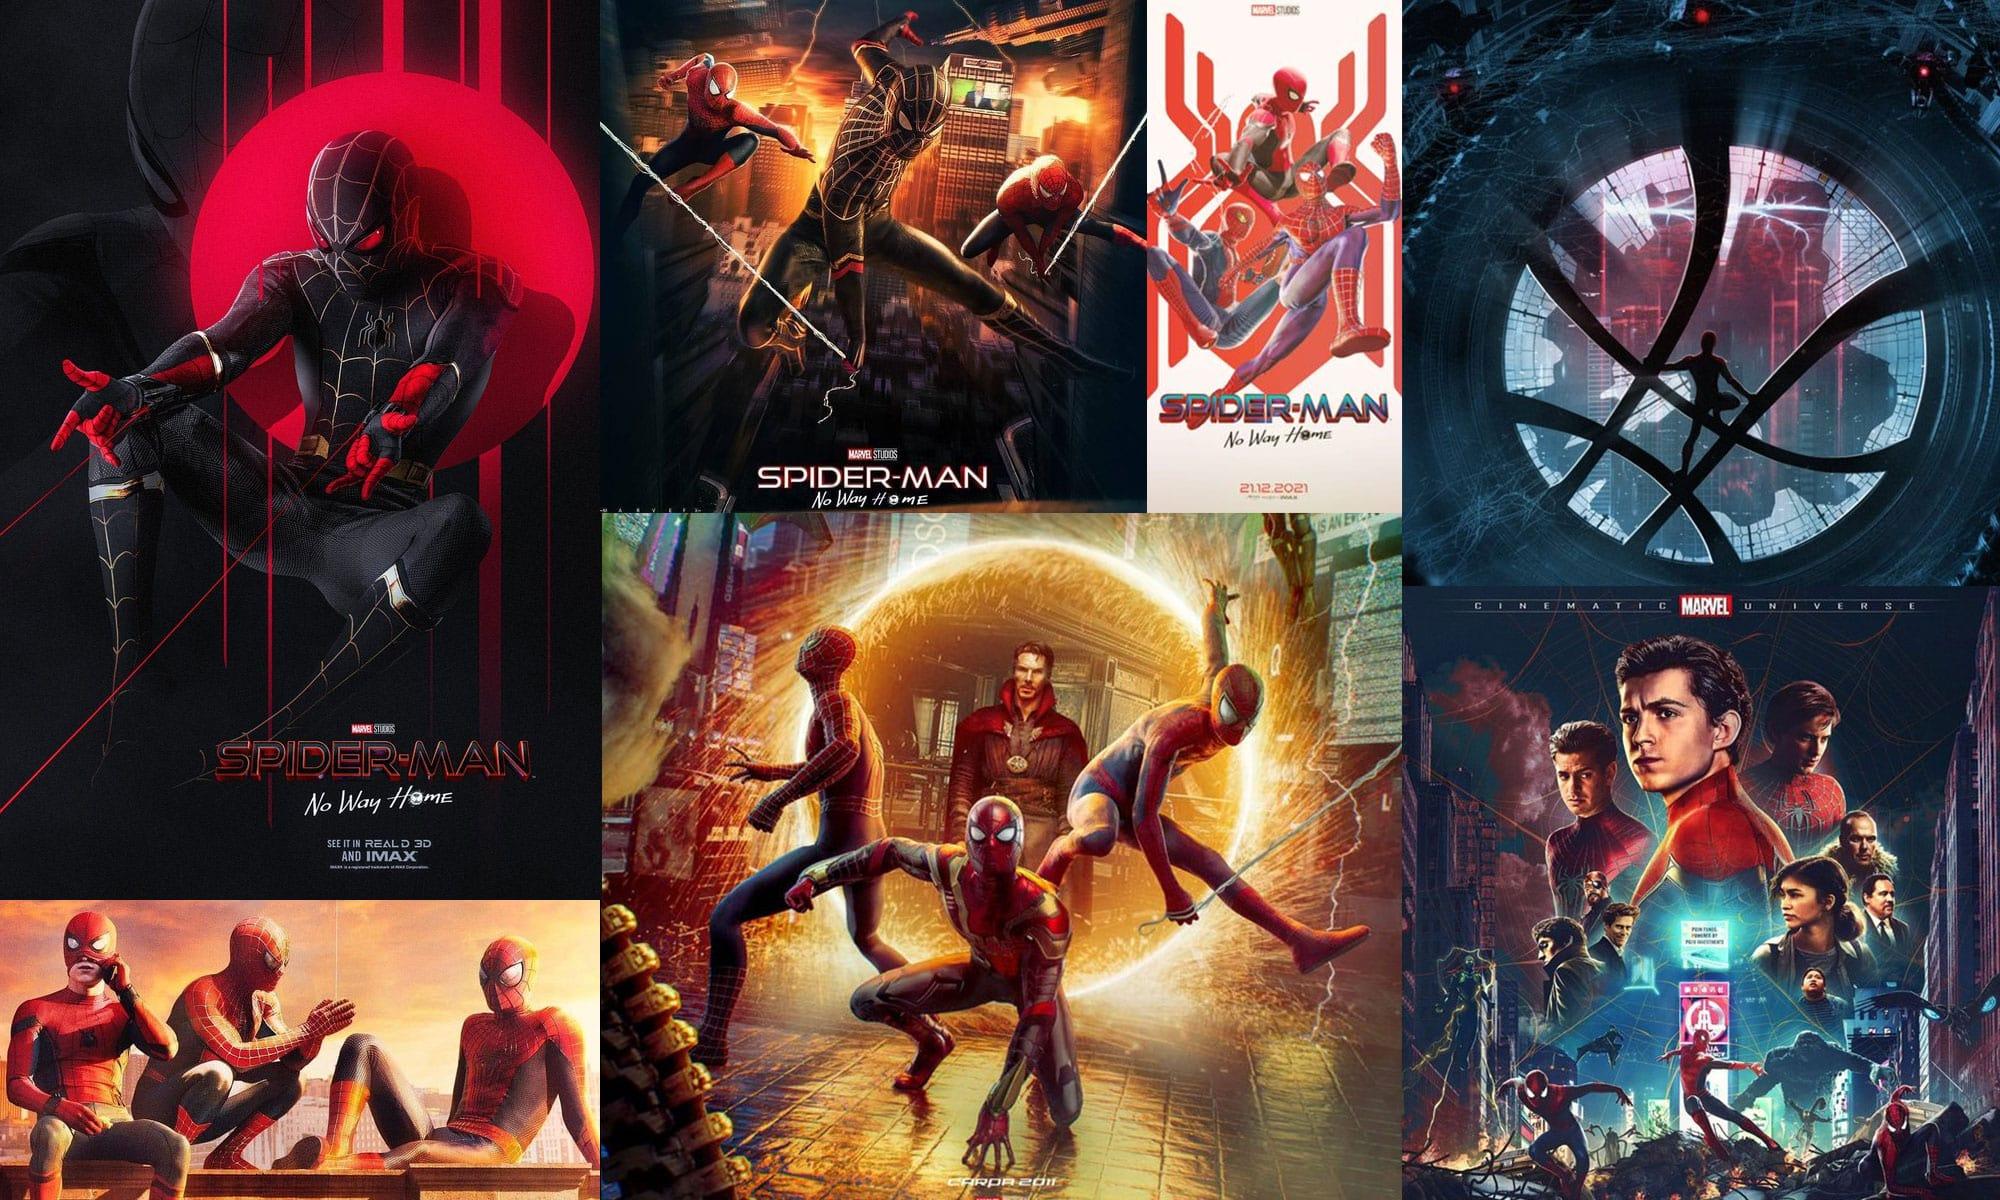 Spider-Man: No Way Home Digital Arts by Fans